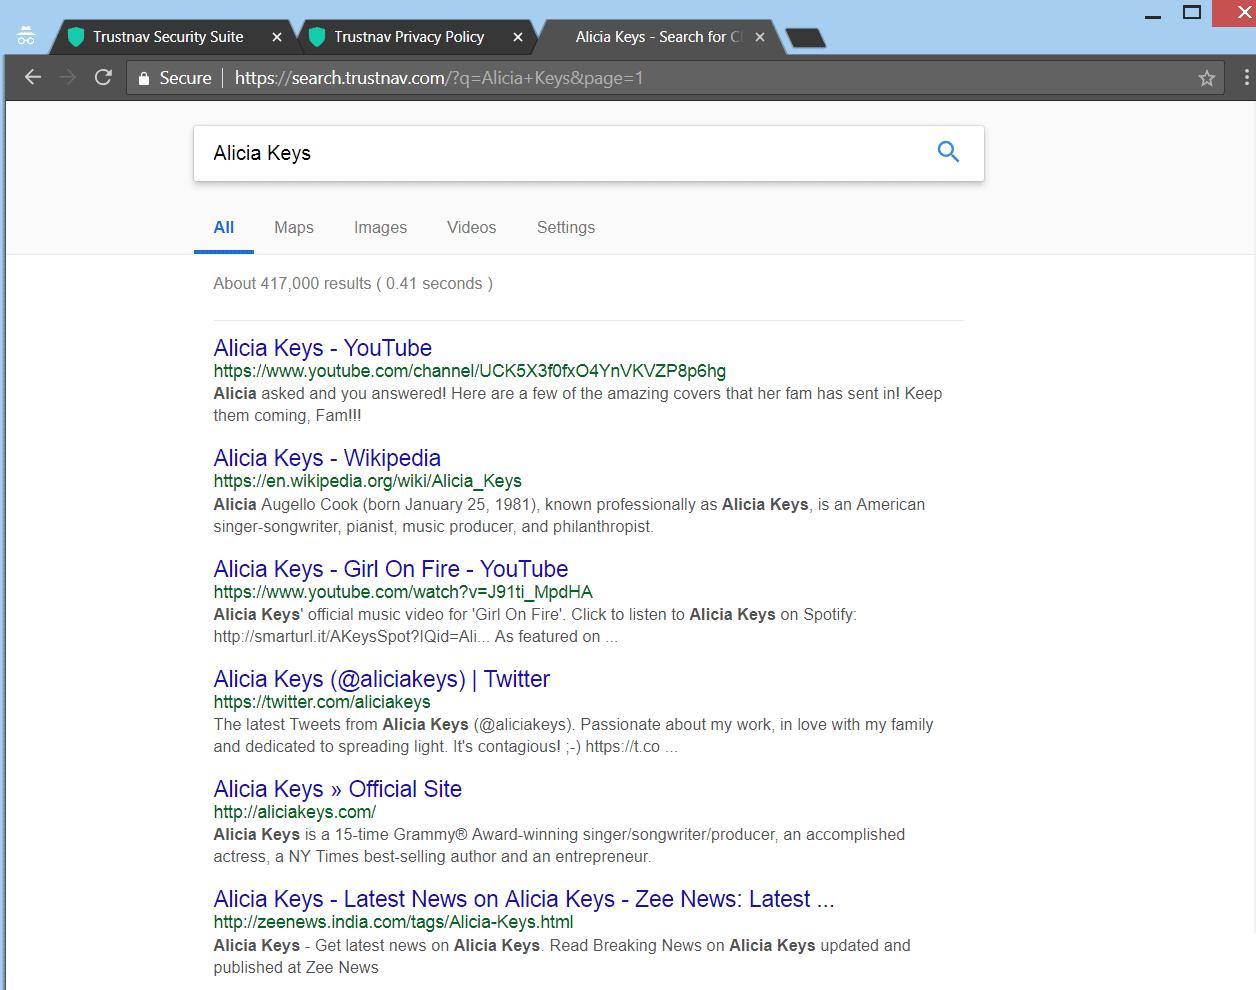 Retire Trustnav.com secuestrador del navegador